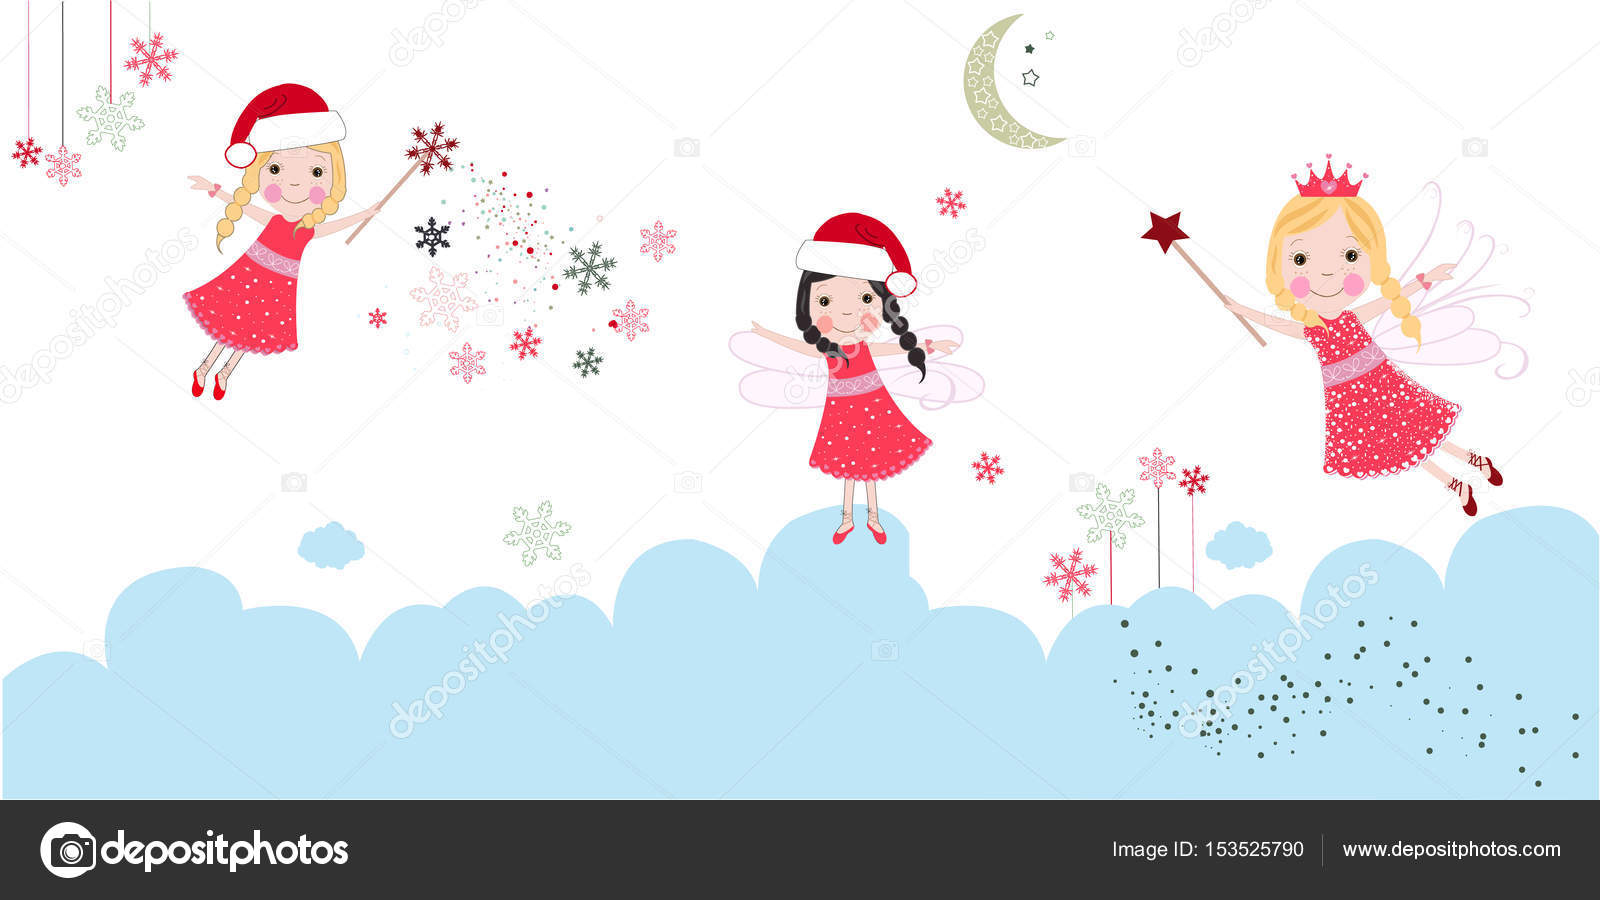 Imagenes De Angelitos Navidenos.Fotos Angelitos Navidad Lindos Angelitos Navidenos Feliz